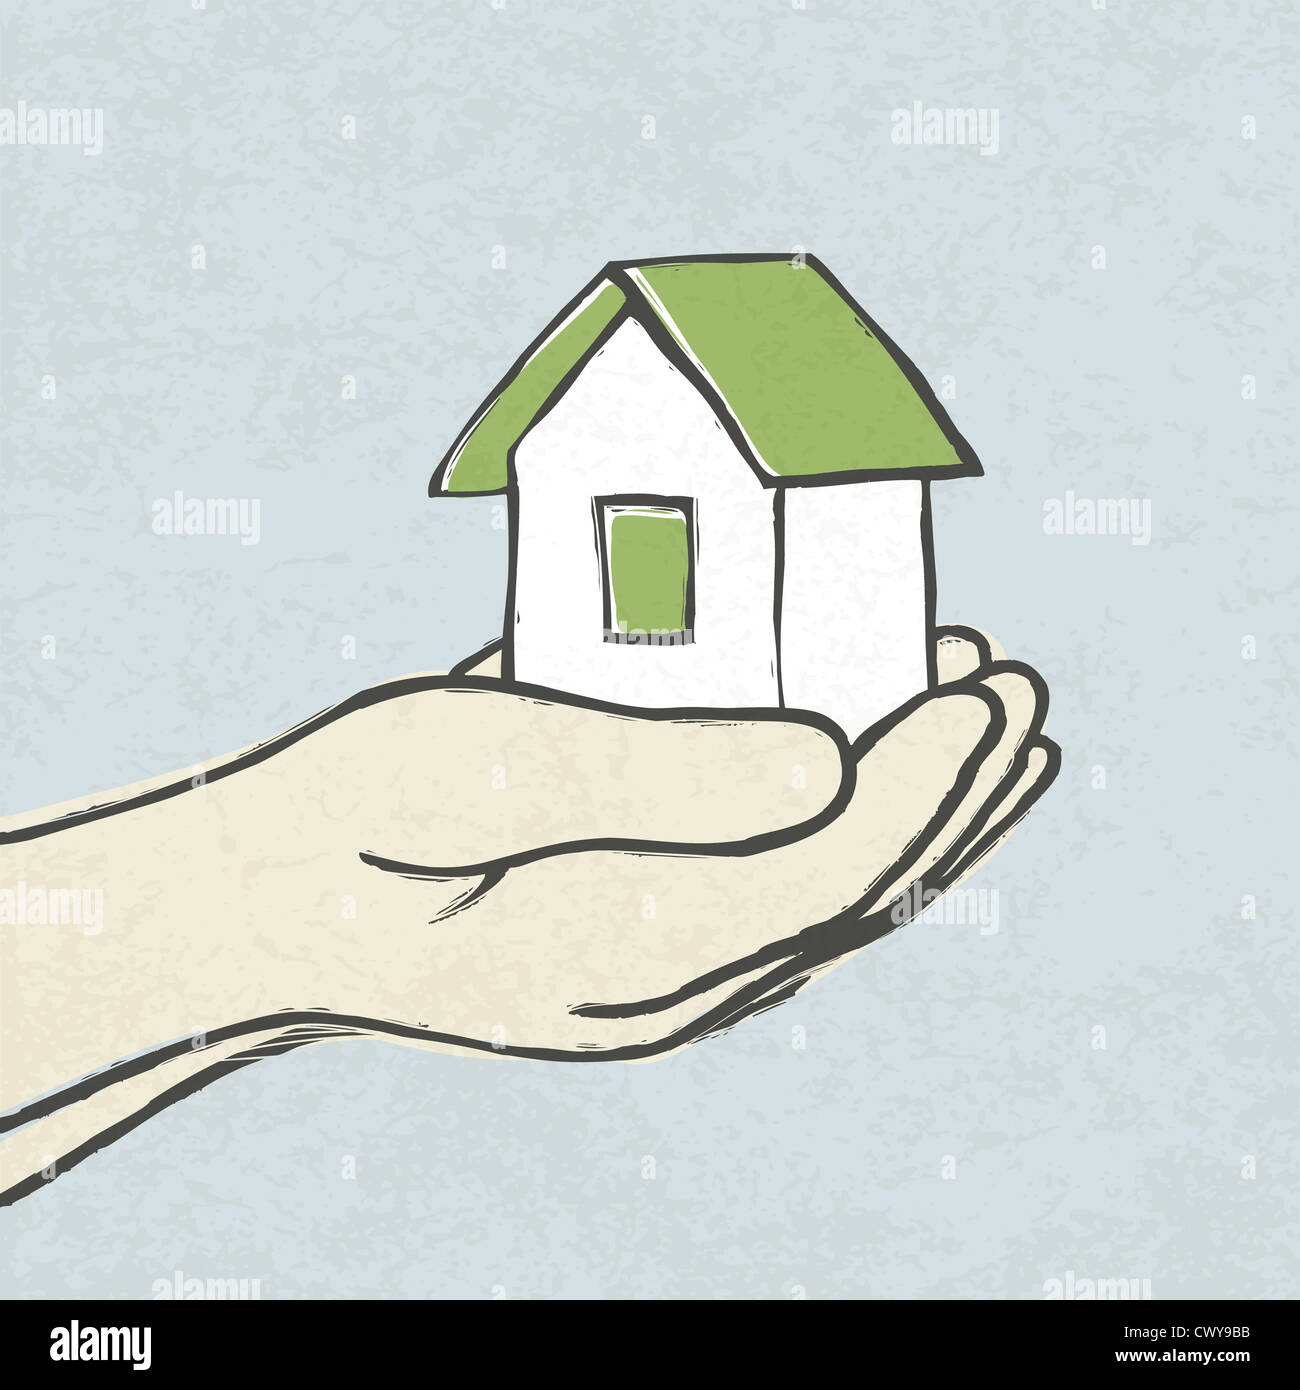 GREEEN-Haus in Händen. Konzept-Abbildung Stockbild